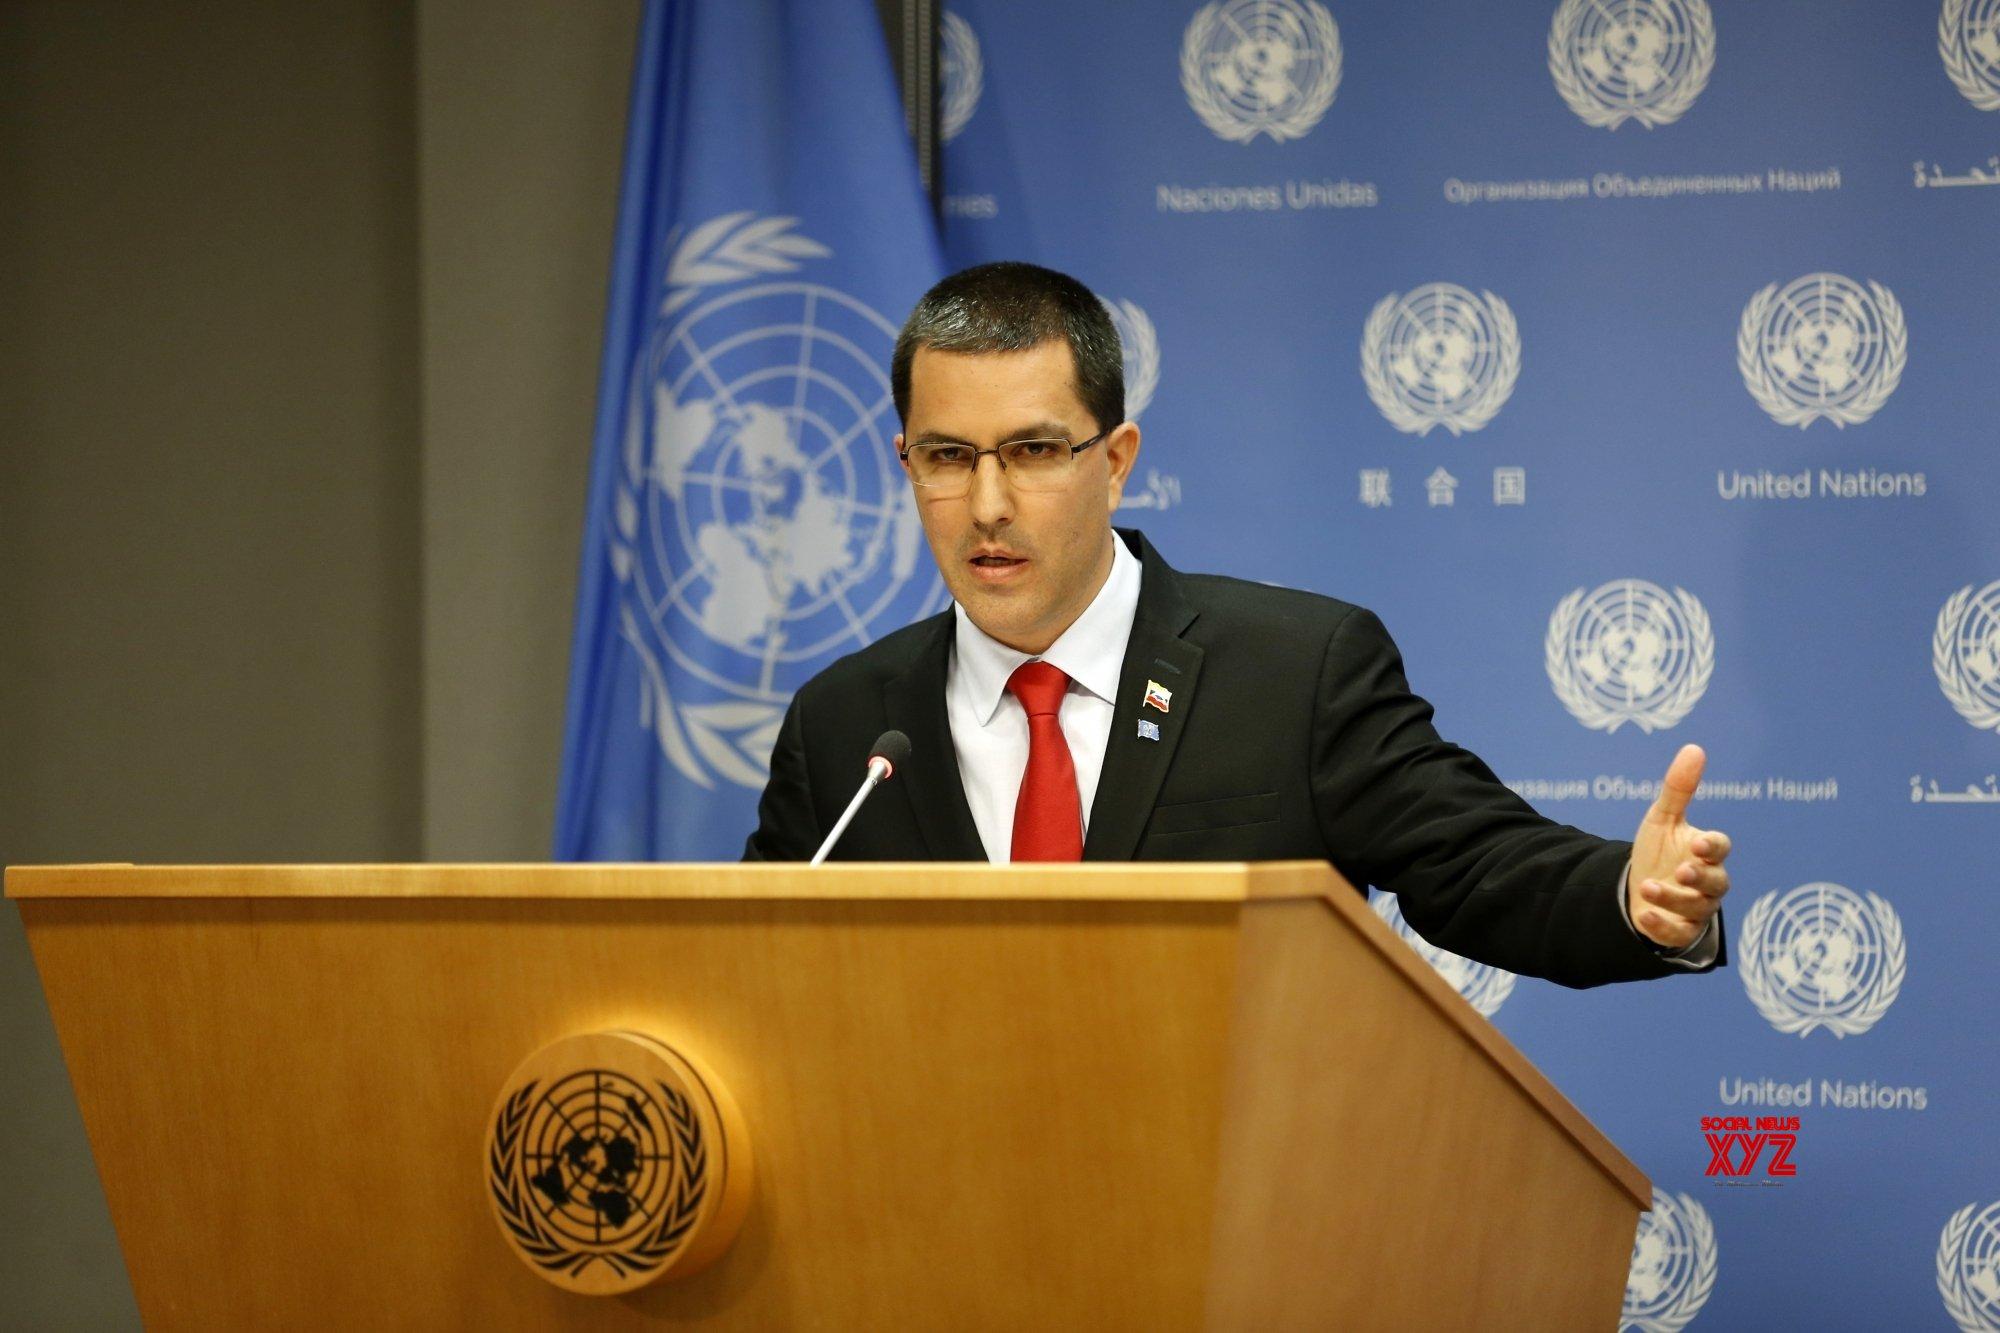 Venezuela Foreign Minister ready to resume talks